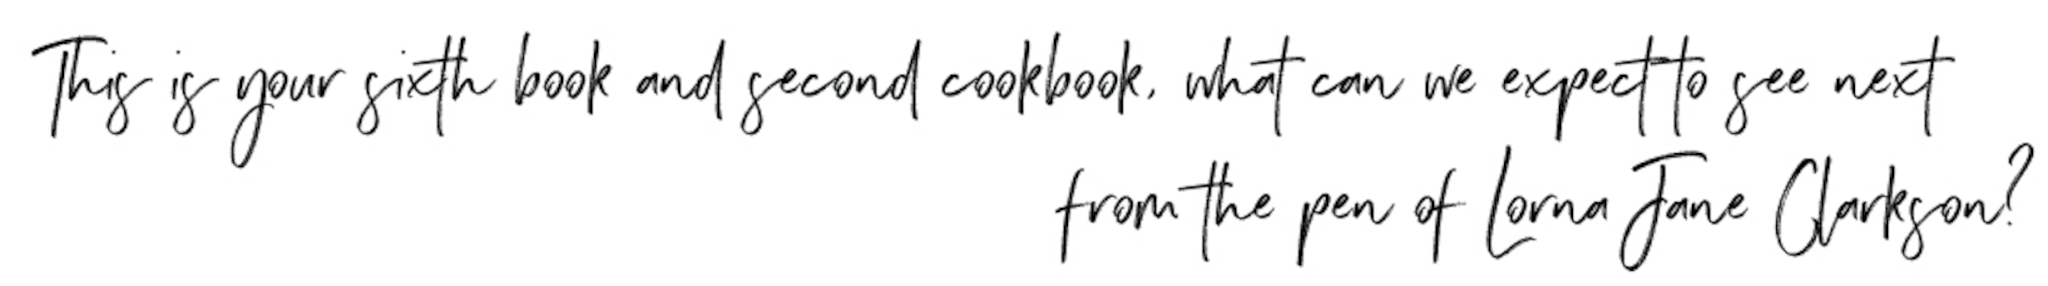 Why I Wrote EAT GOOD FOOD